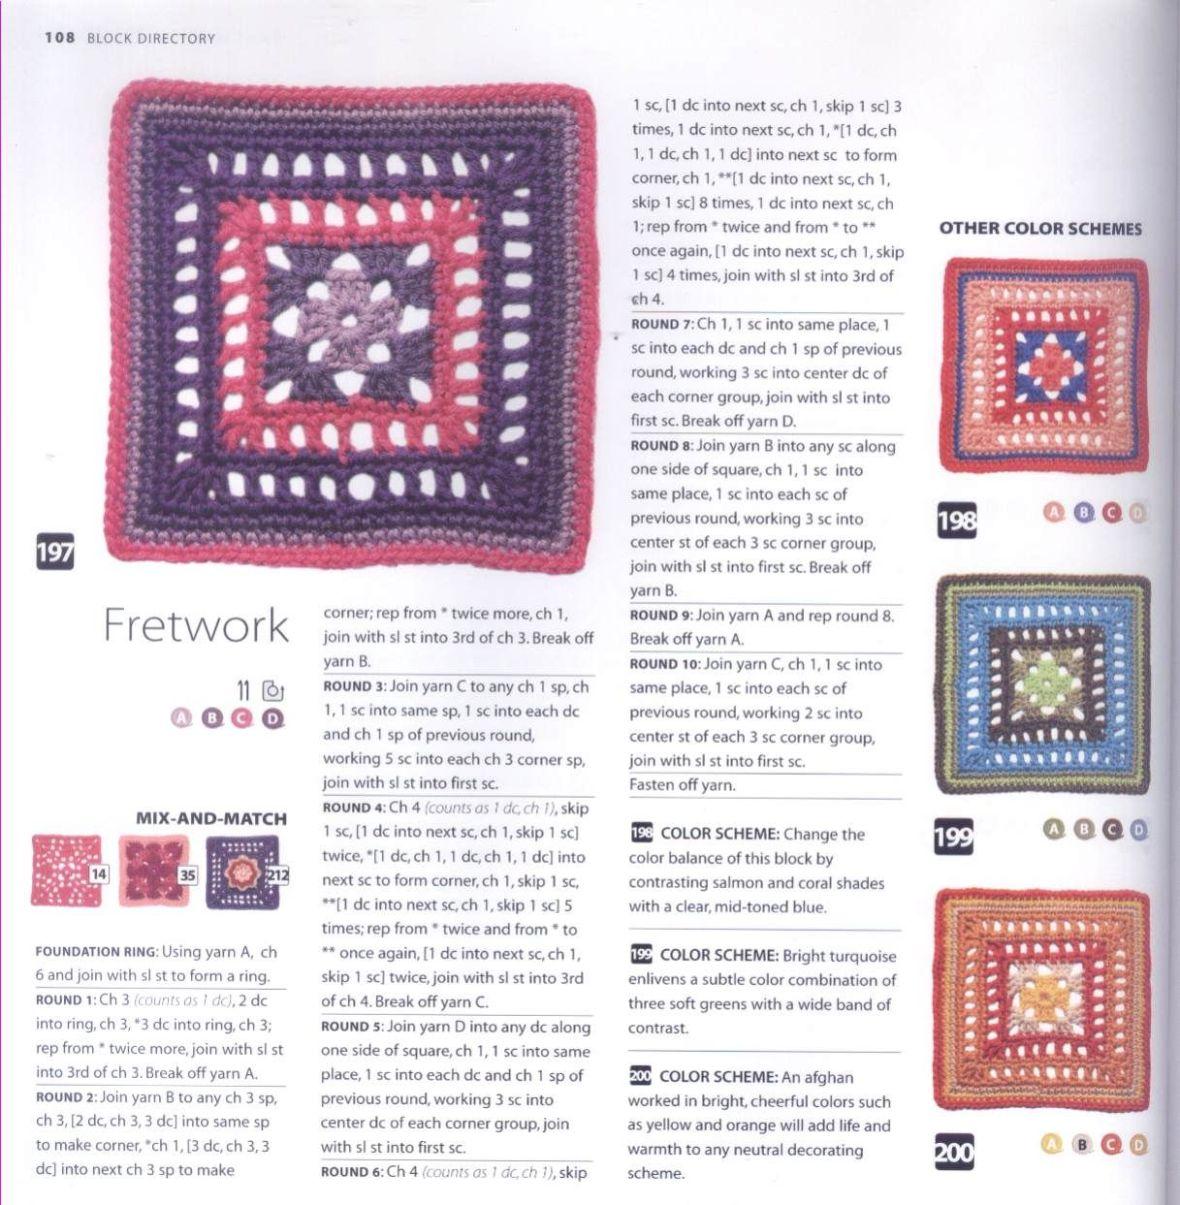 200 Crocheted Blocks for blankets, throws & Afghans 108